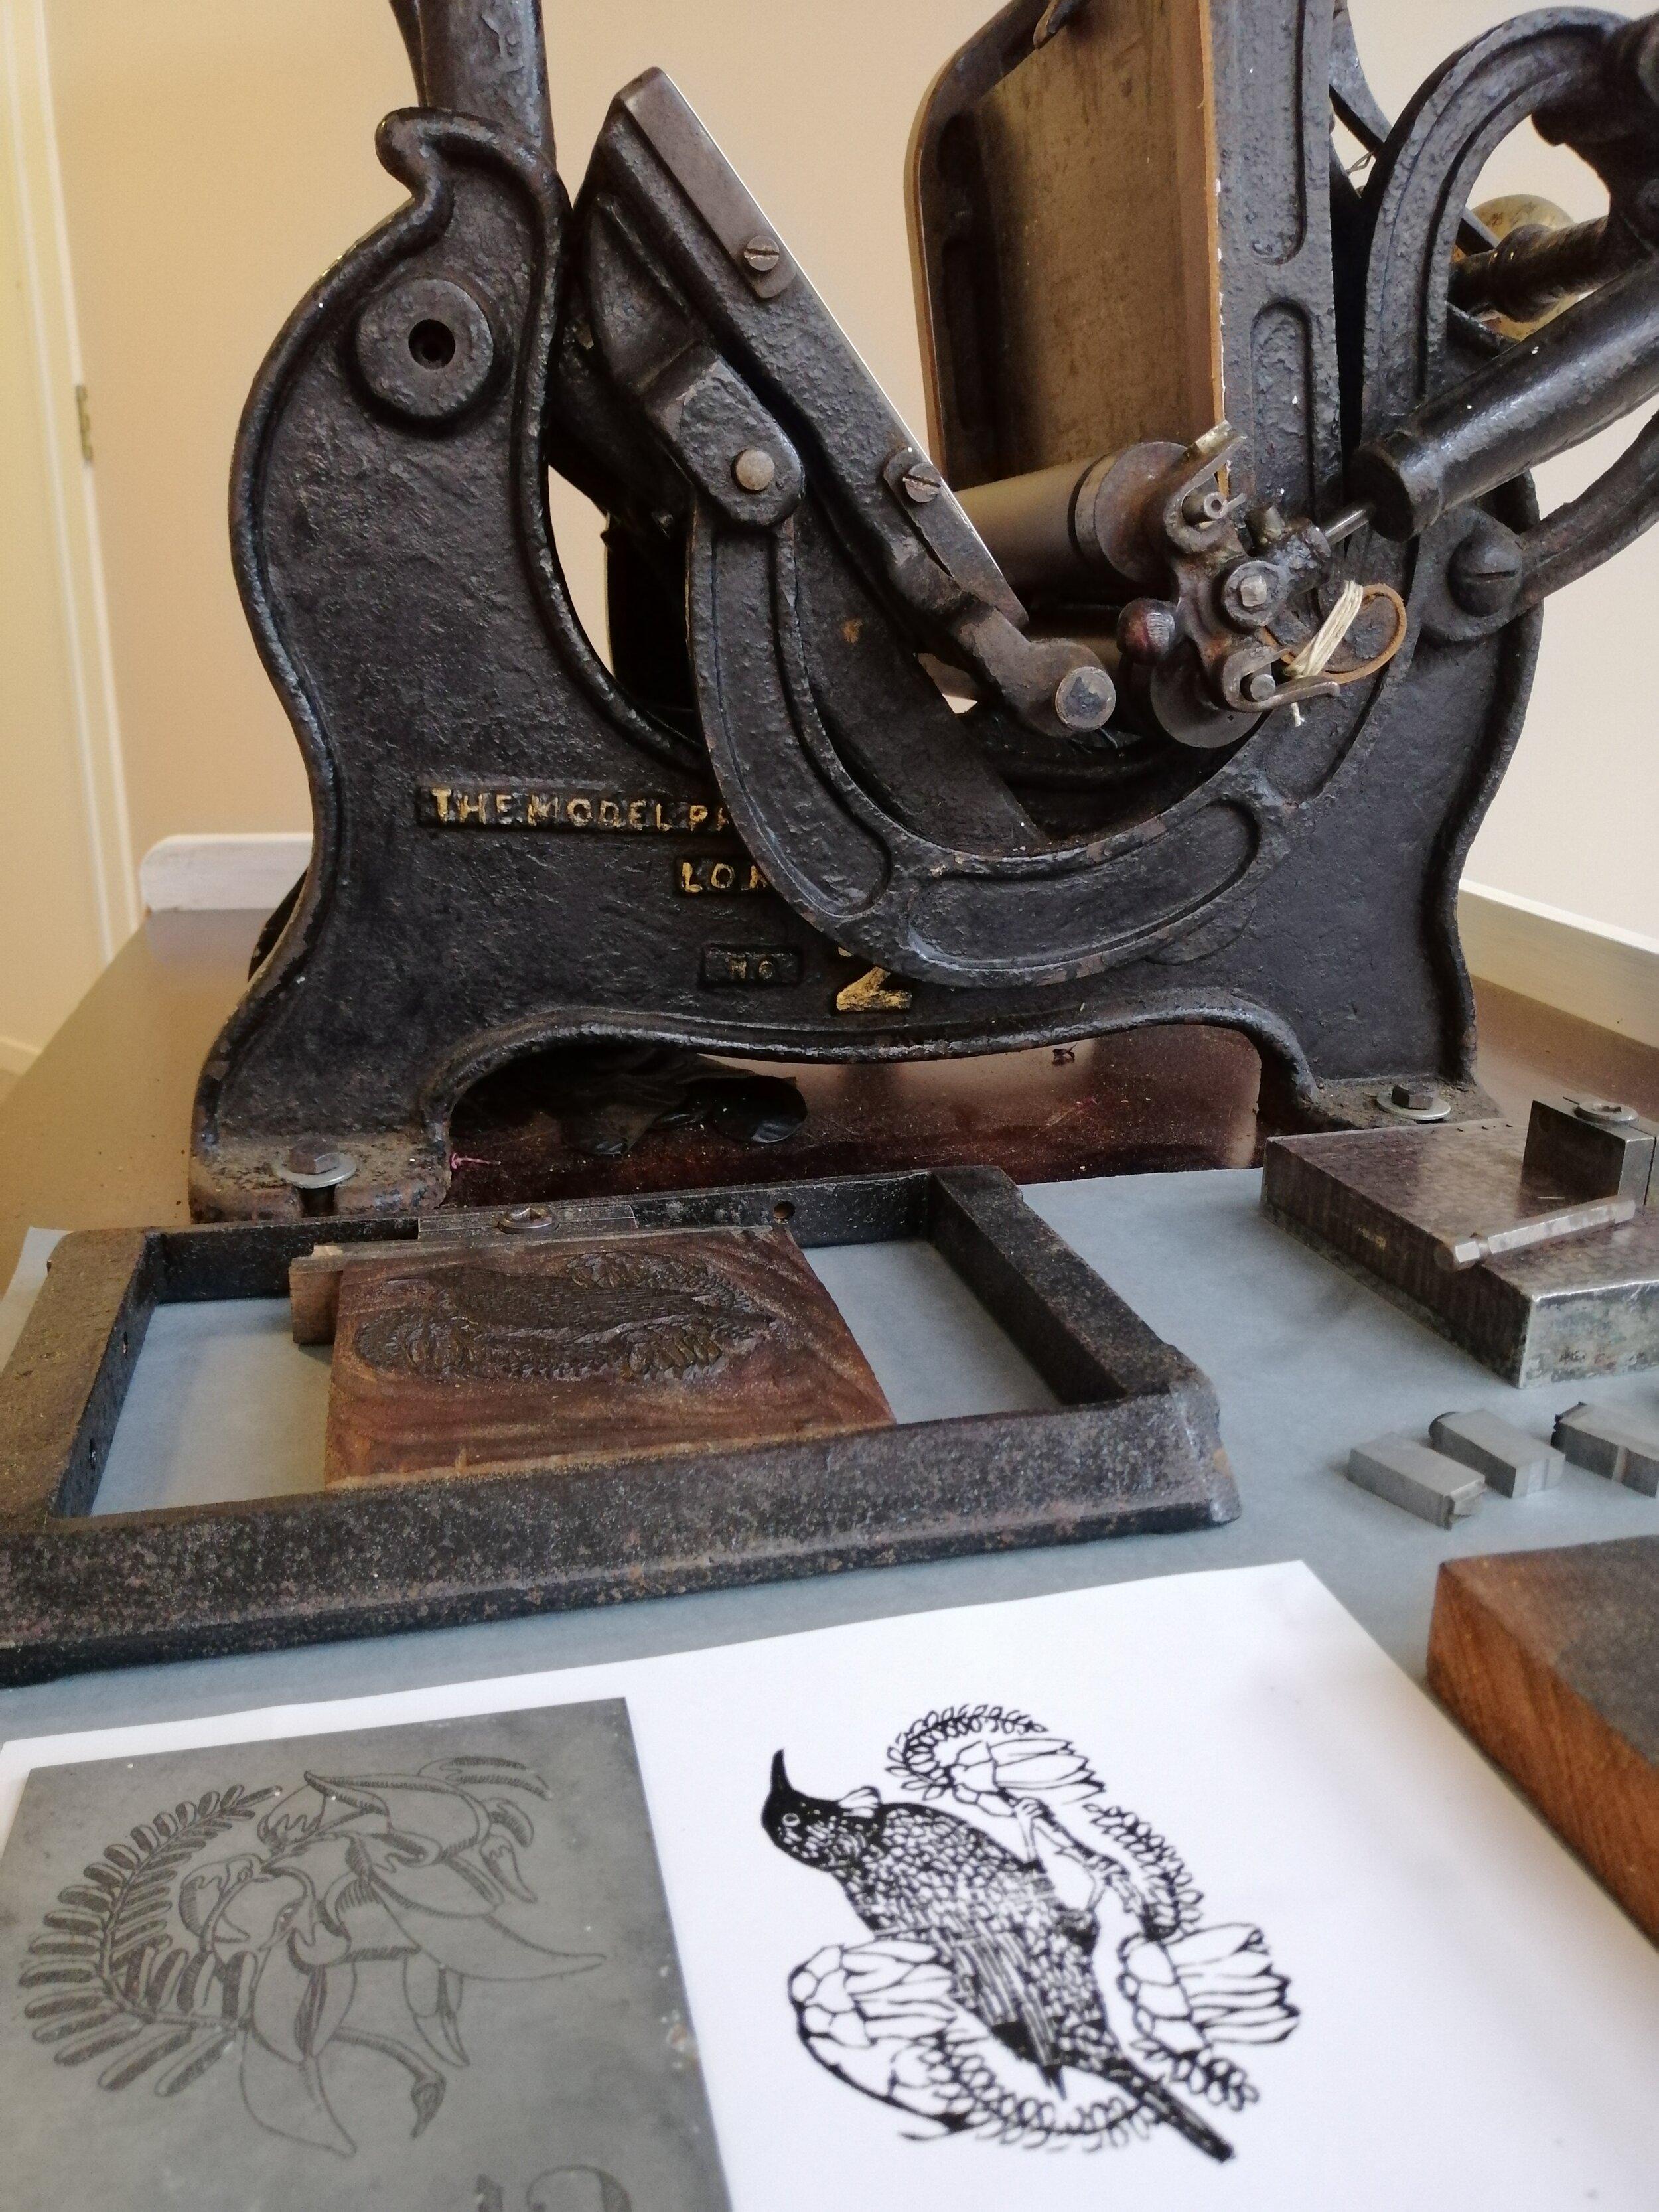 printing press 2.jpg